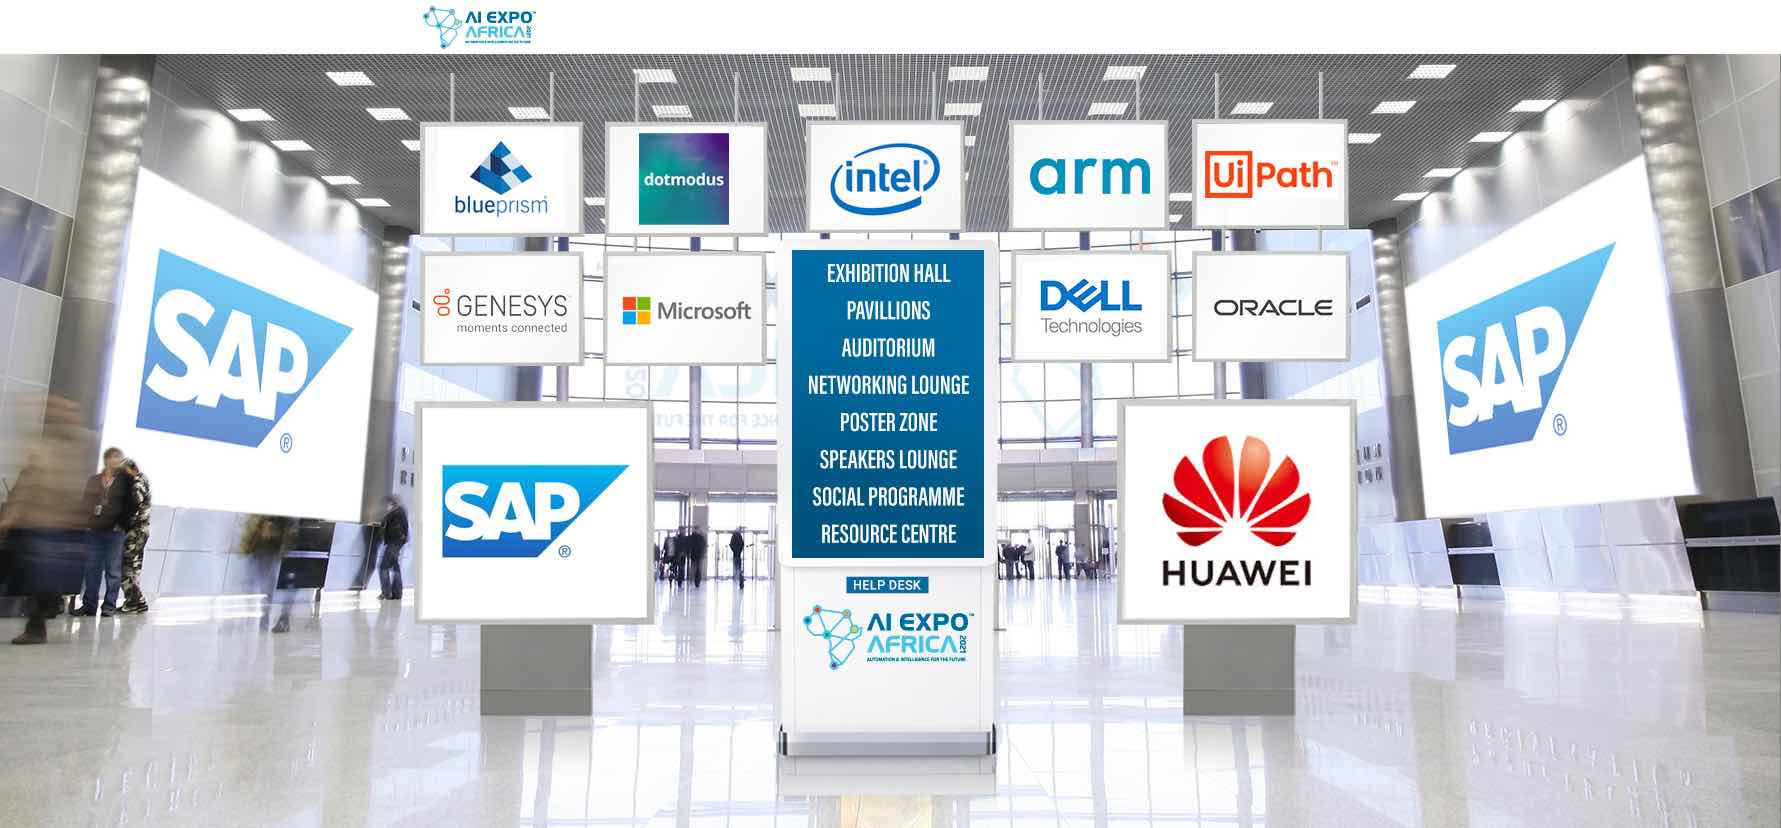 AI Expo Africa ONLINE Lobby Area